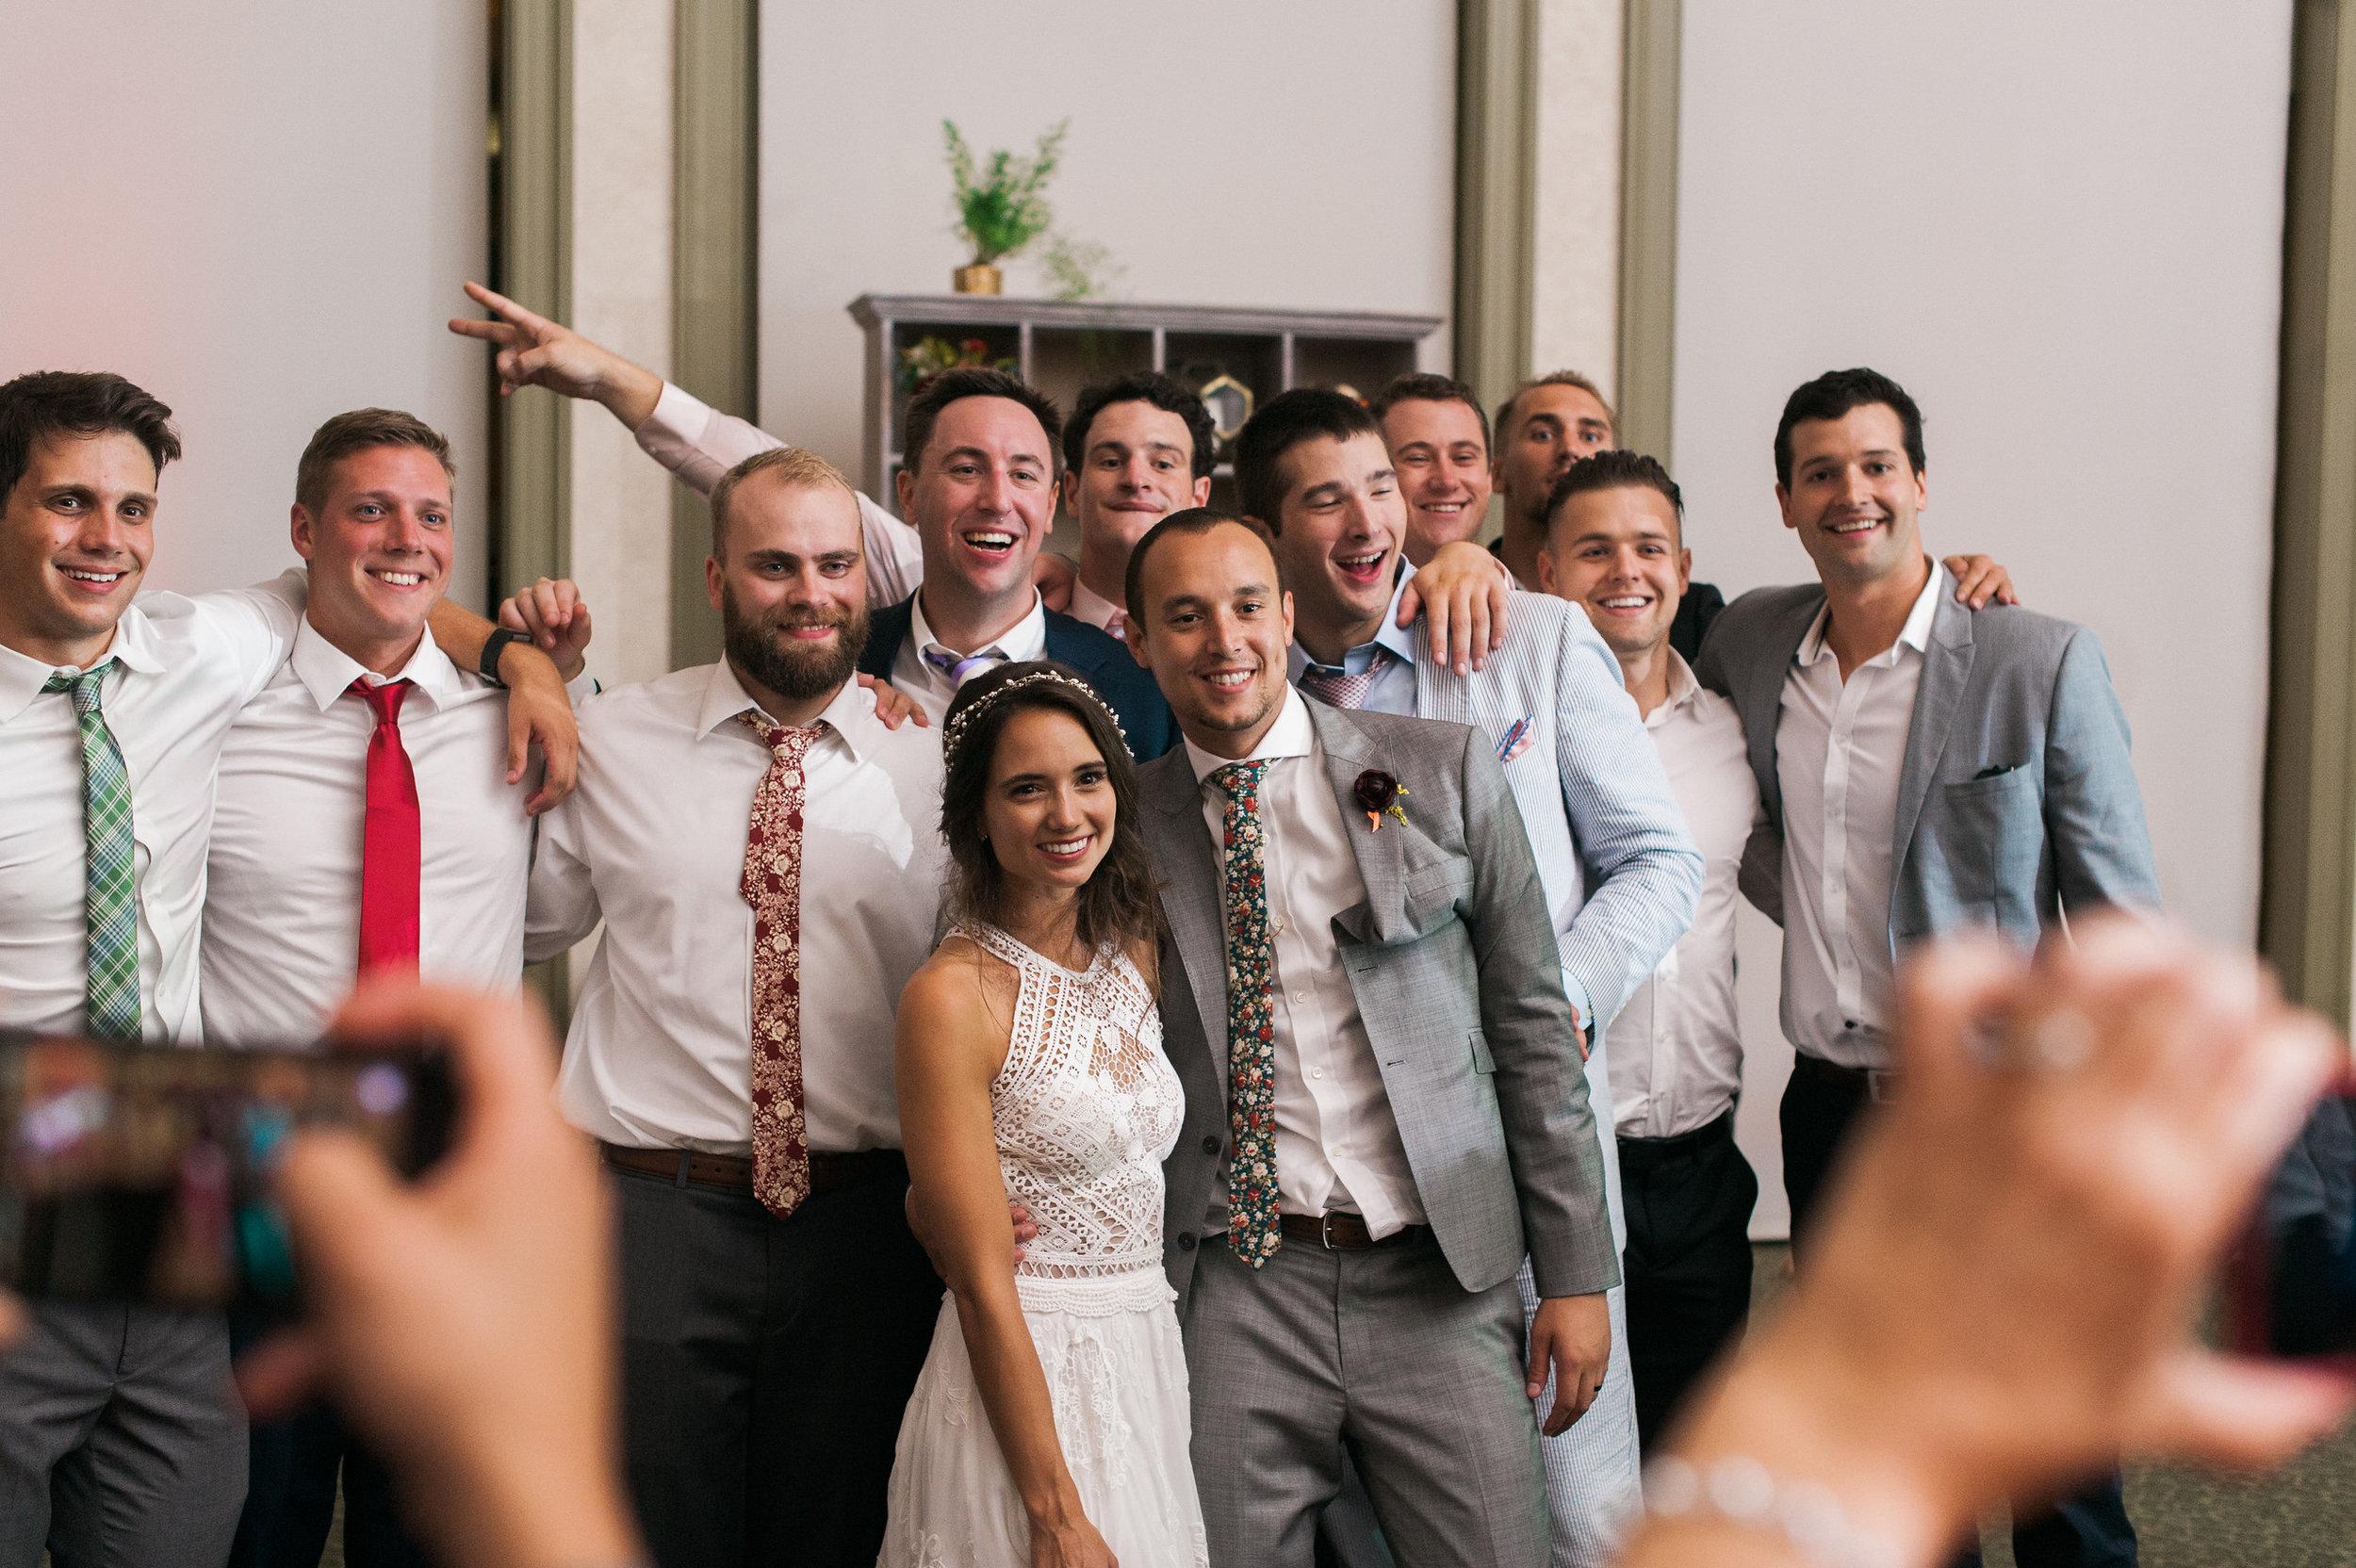 thomas-wedding-554-X5.jpg